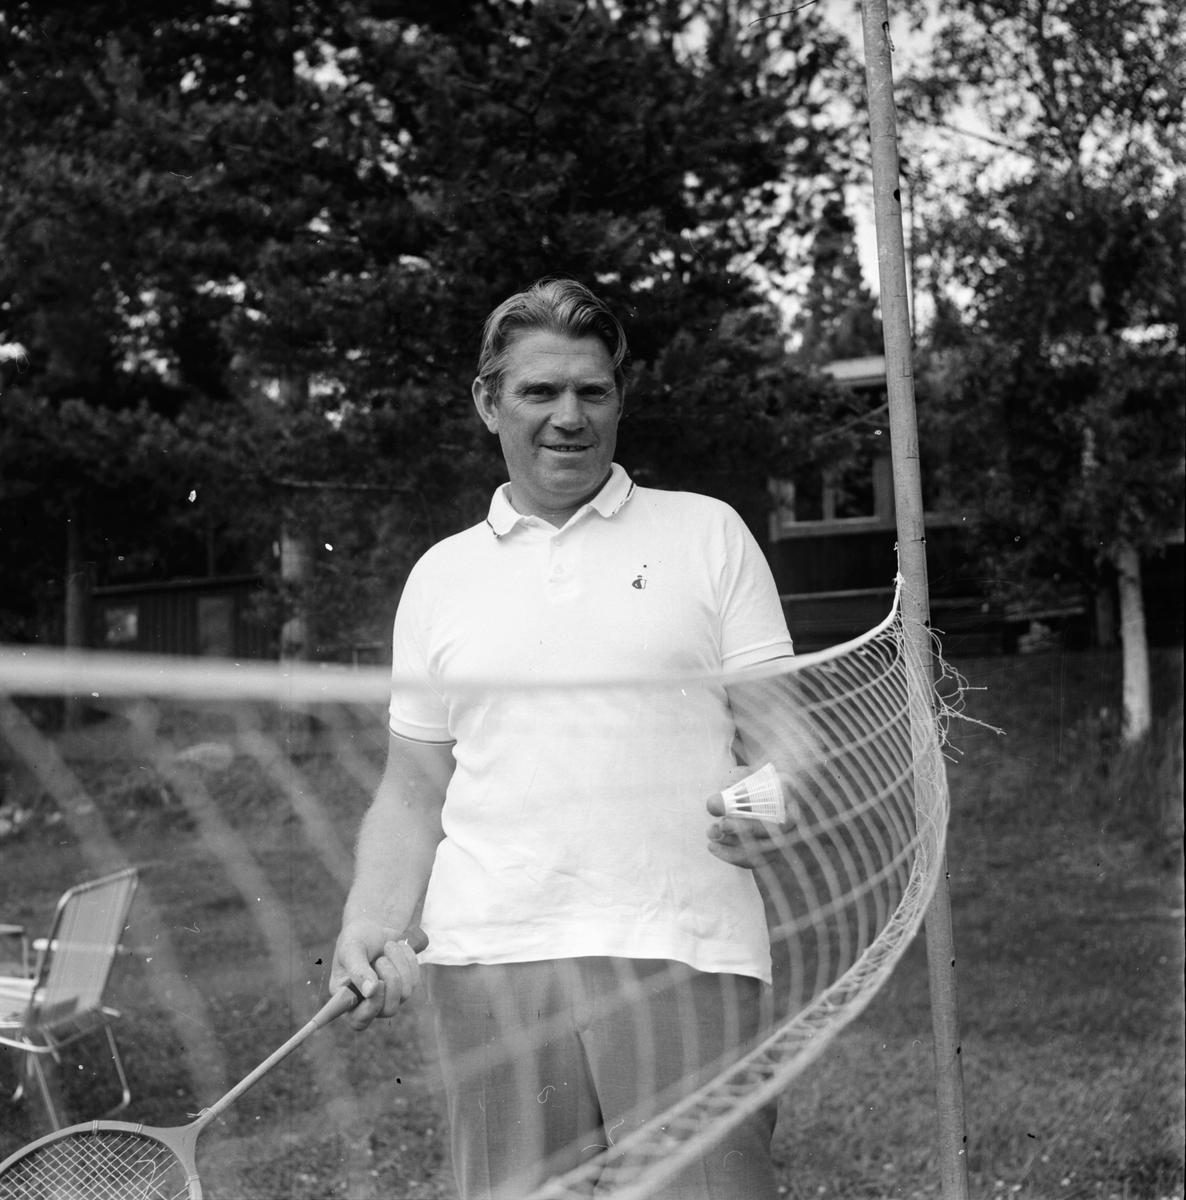 Tomterna, Olle Orgård, Juli 1970